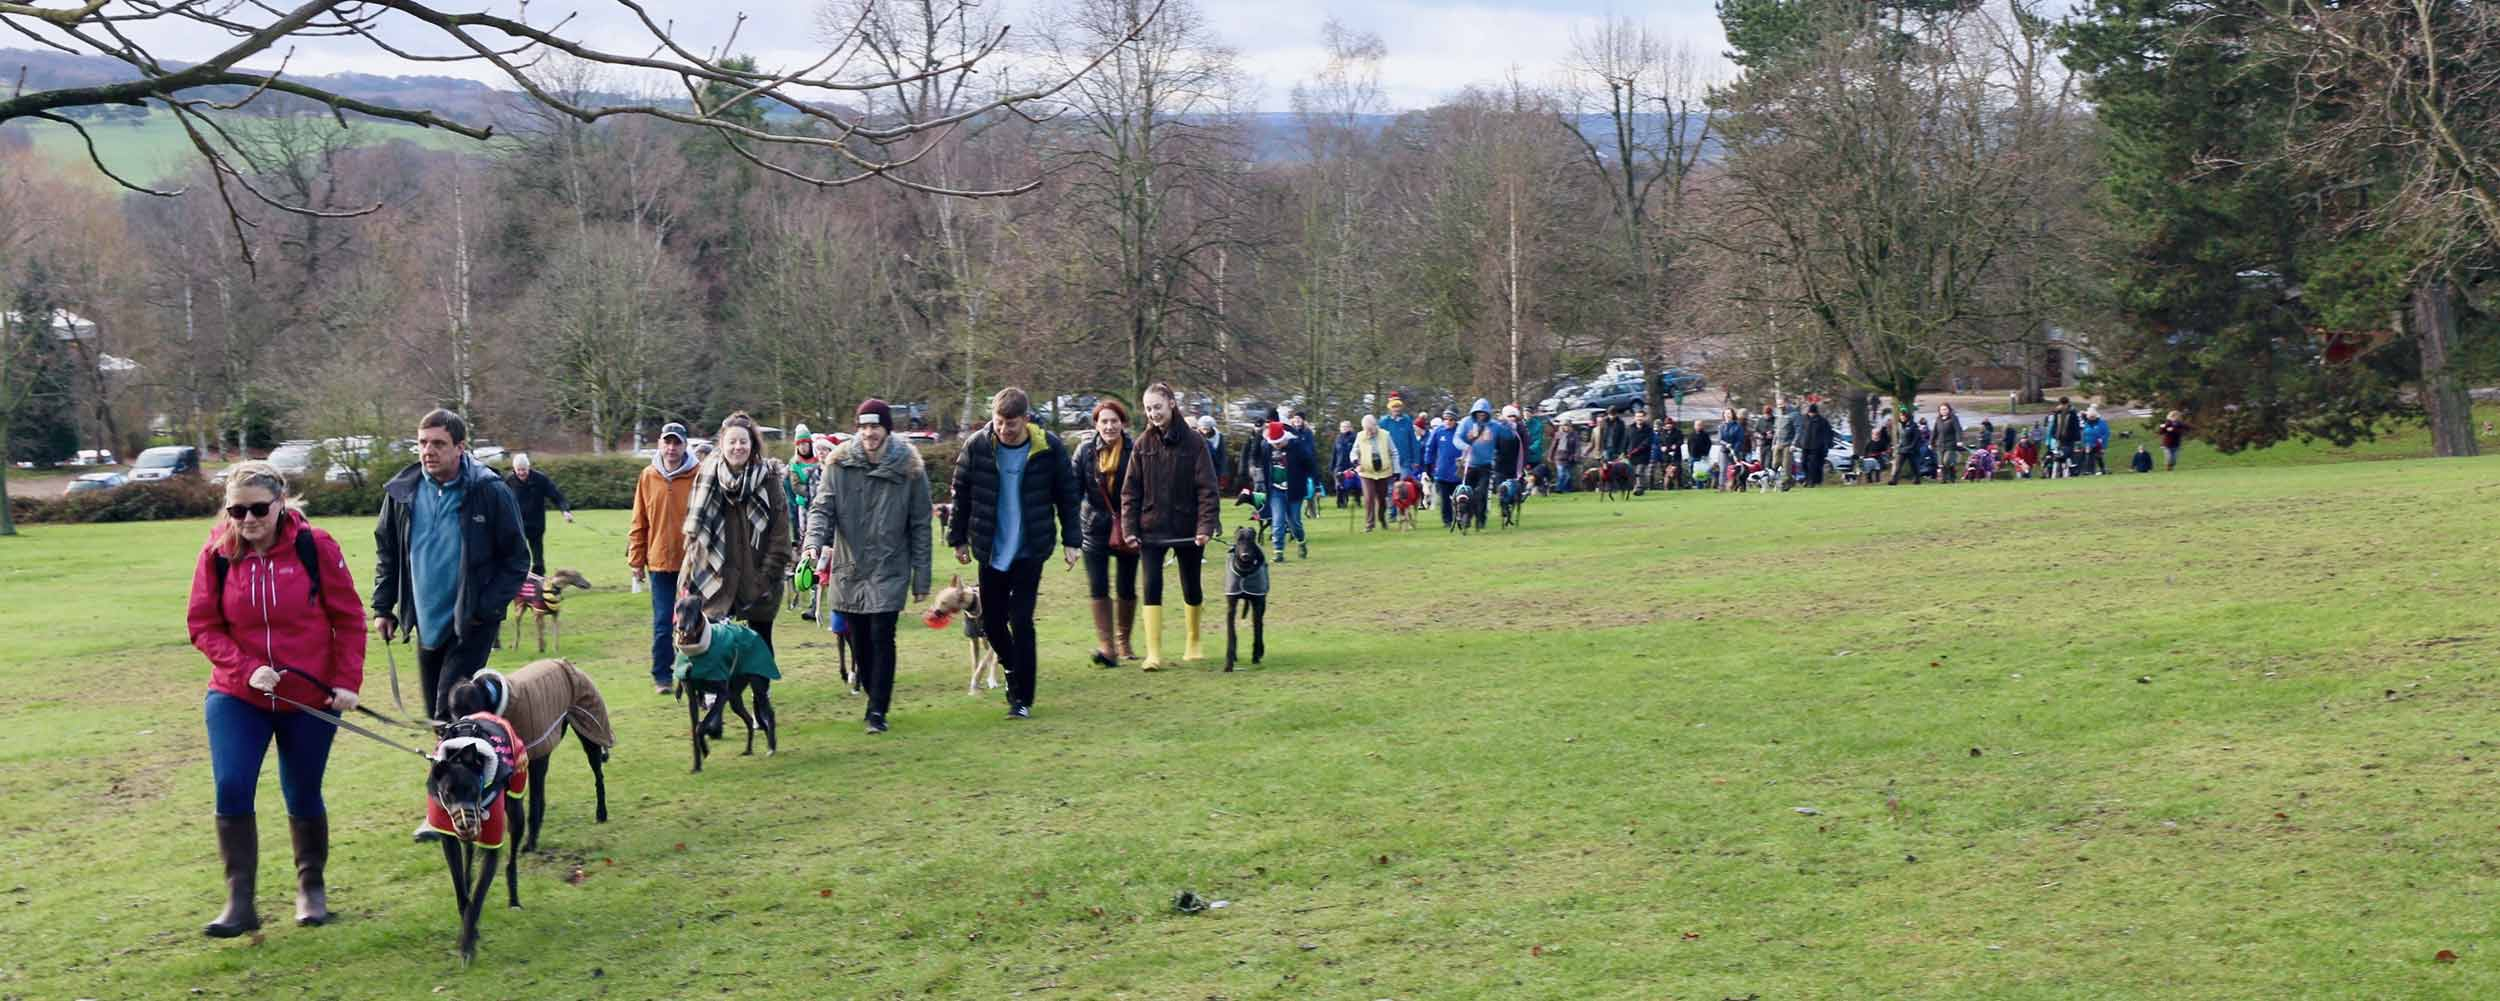 Santa Paws walk at Yorkshire Sculpture Park